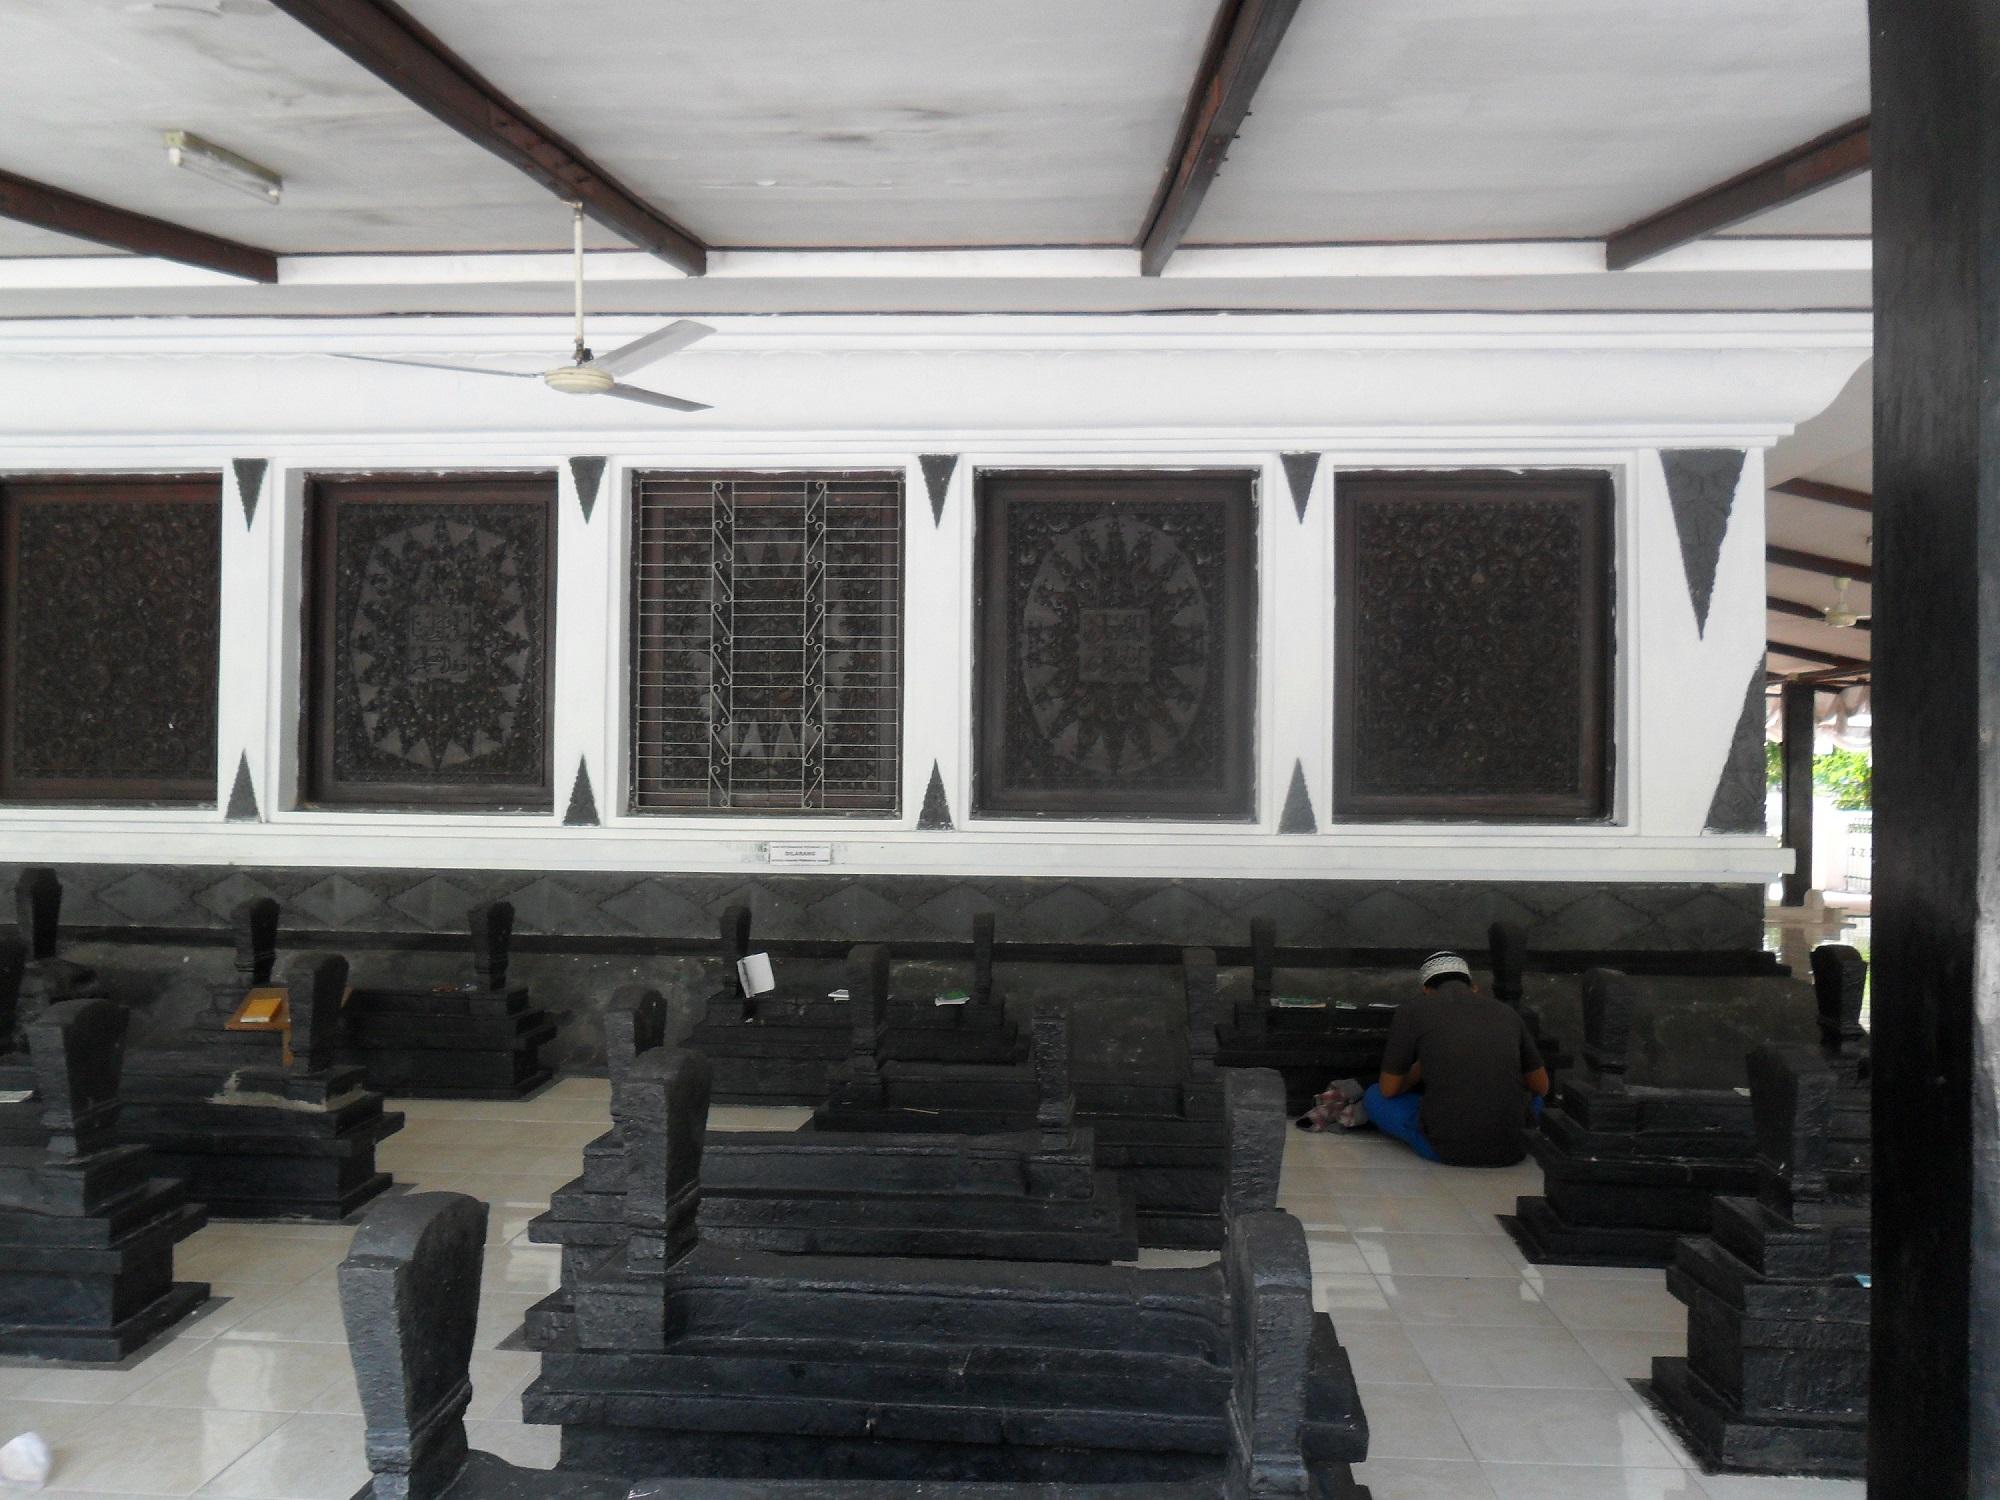 Ziarah Makam Sunan Kalijaga  Masjid Agung Demak